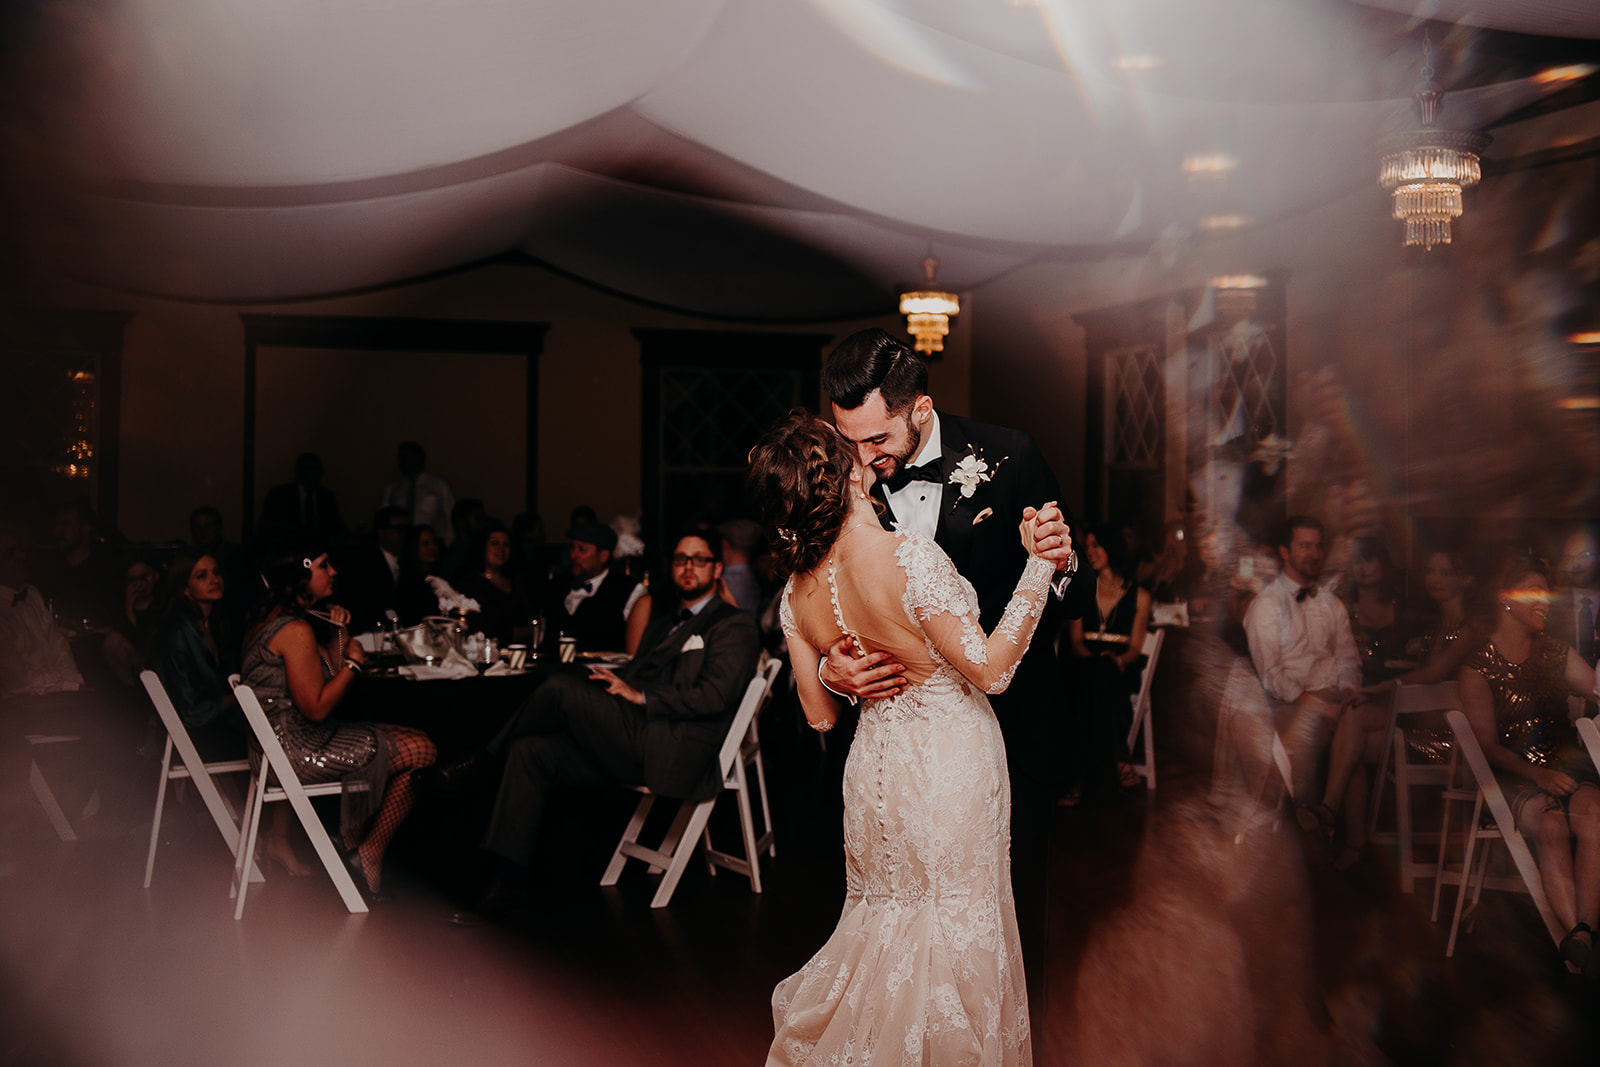 bellingham-wedding-broadway-hall-natalie-levi-reception (79 of 120).jpg